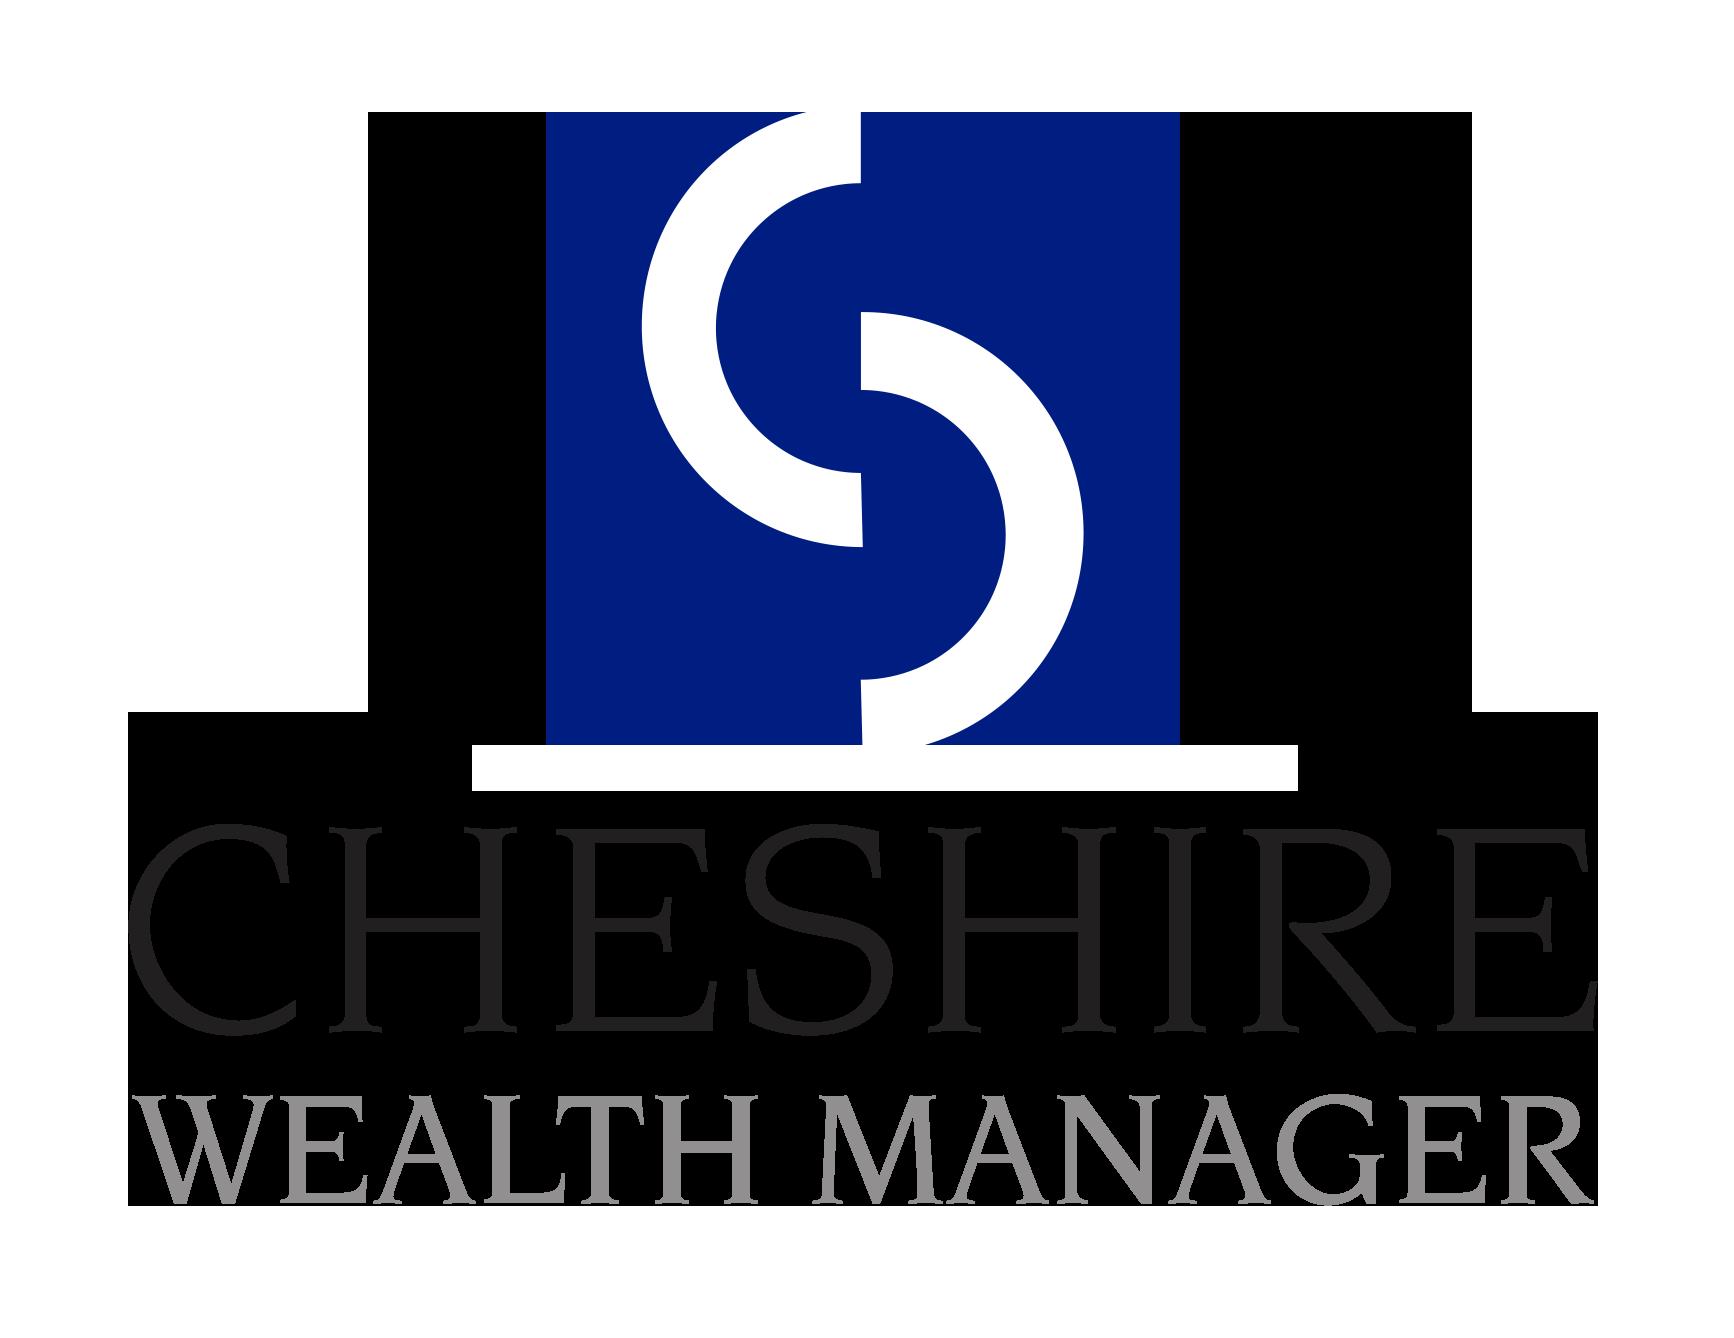 Cheshire Software, Inc company logo